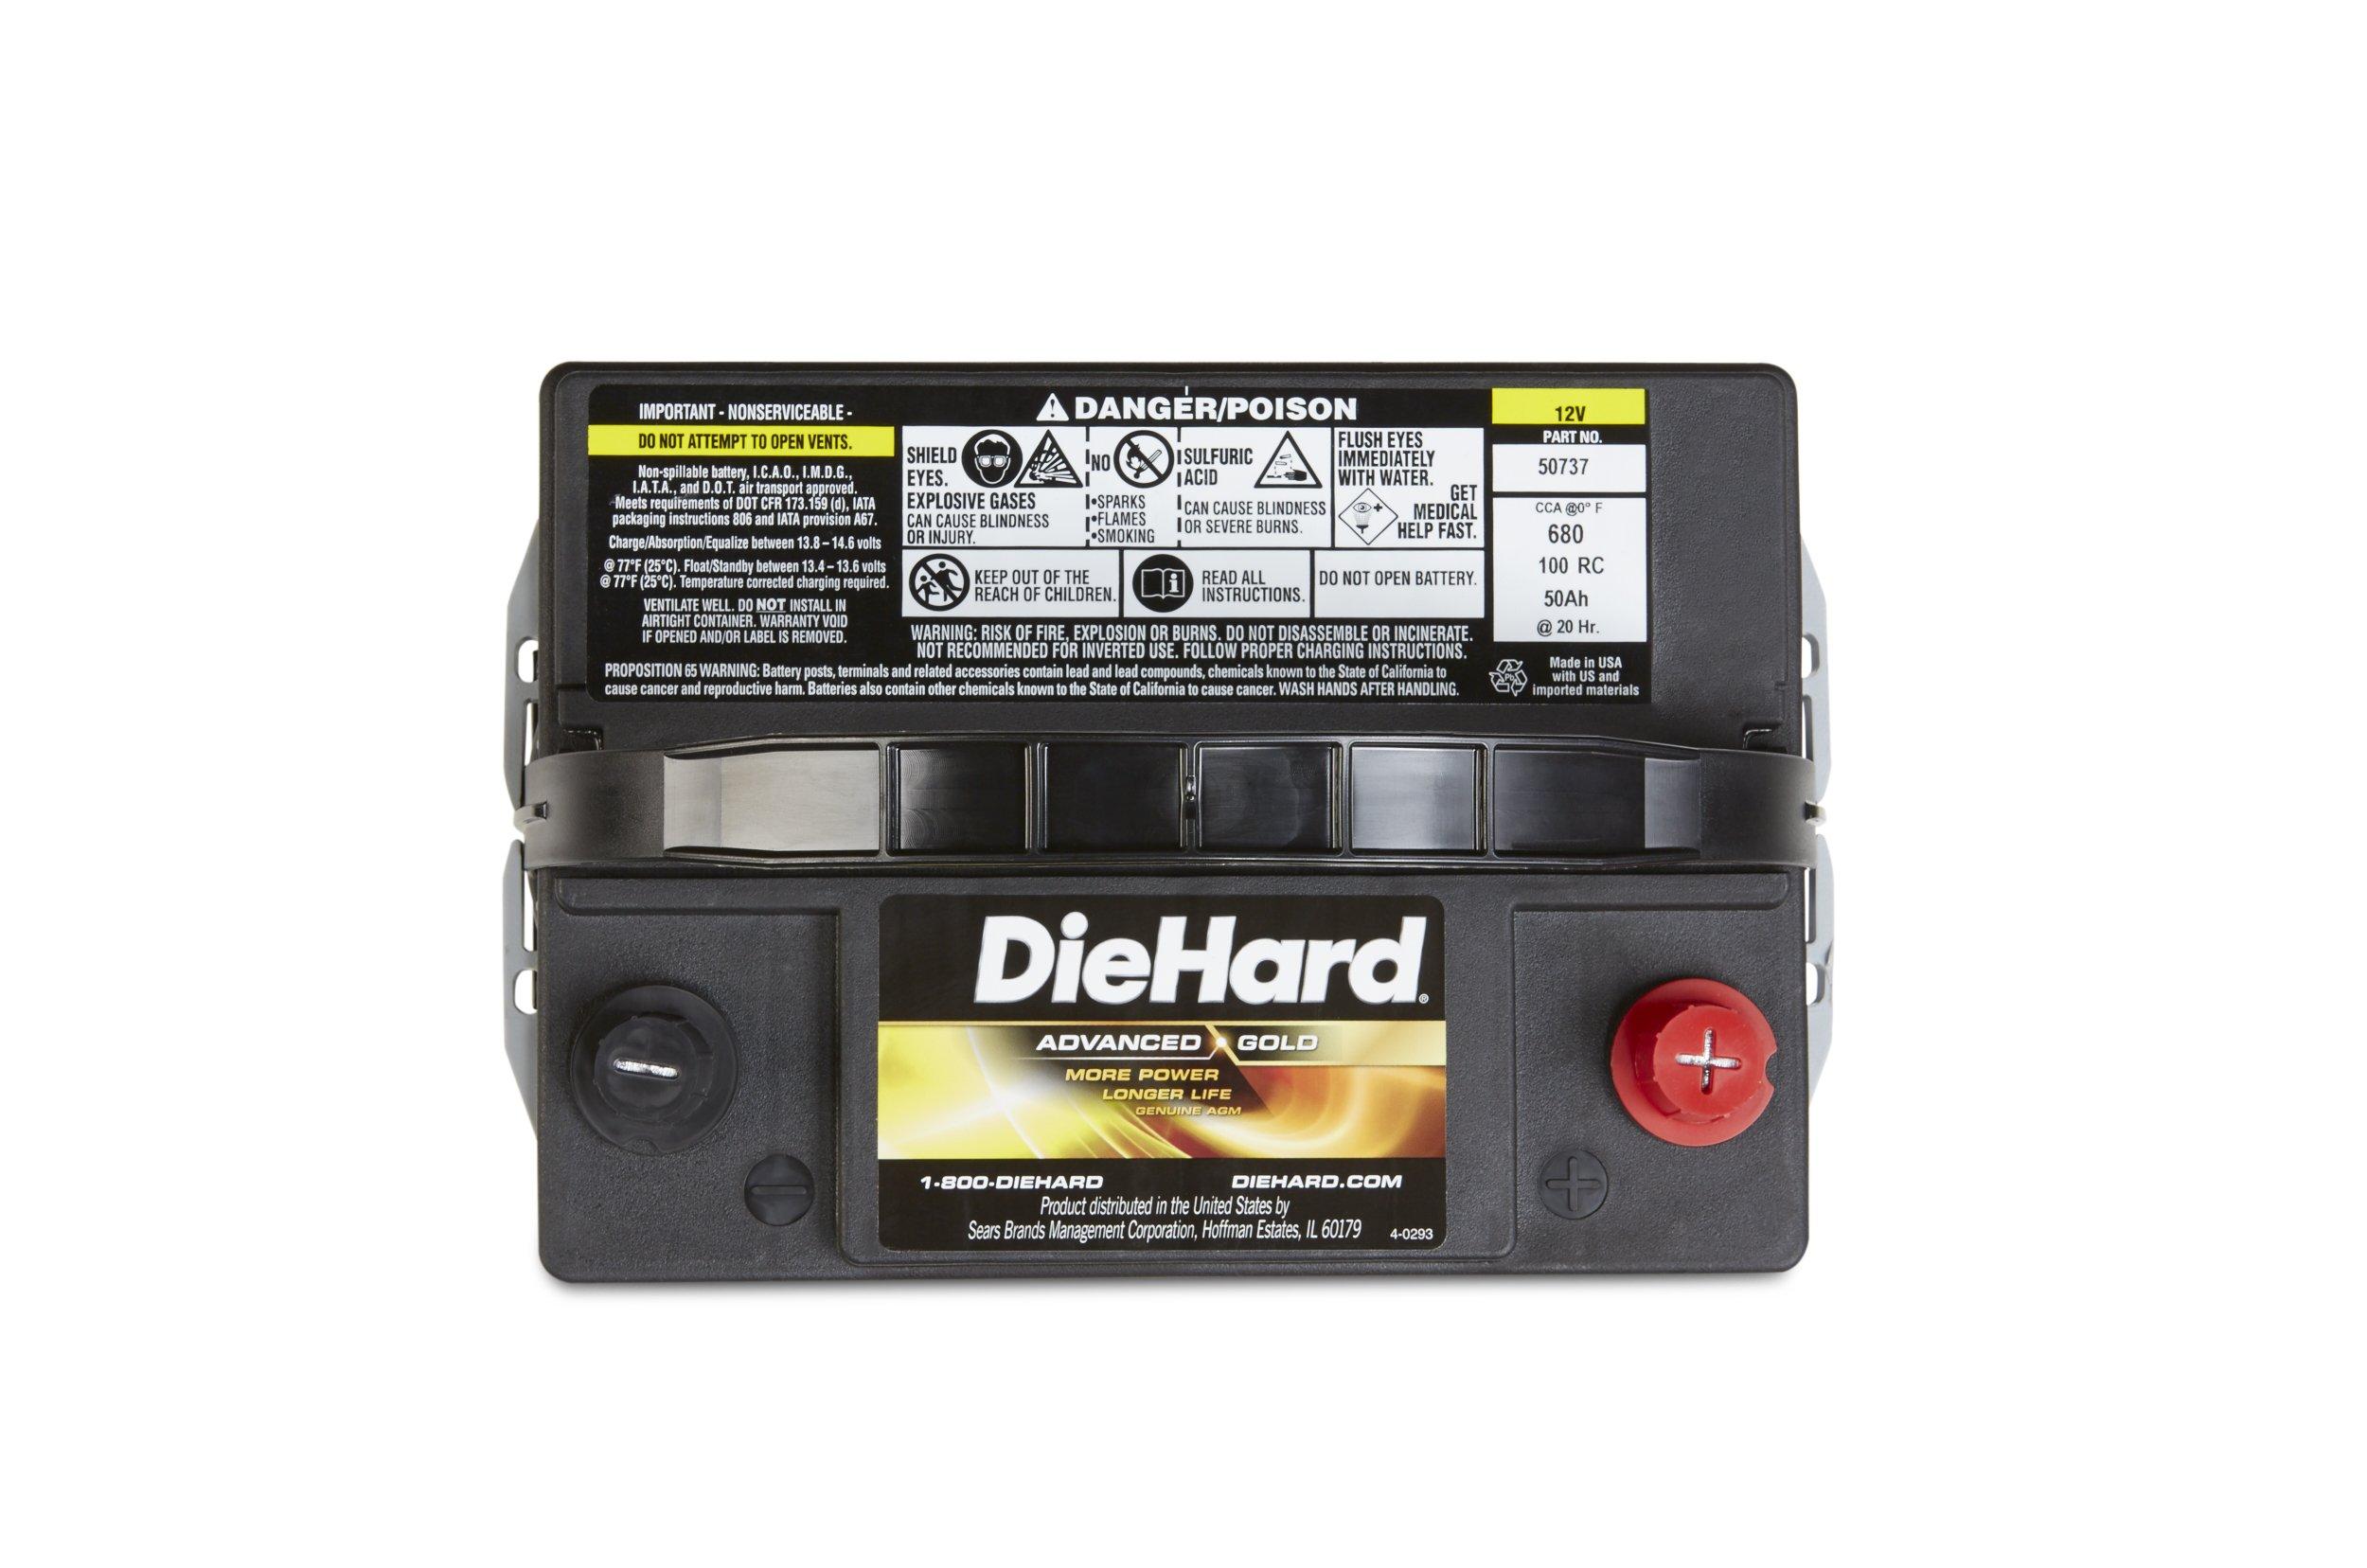 DieHard 38275 Advanced Gold AGM Battery (GP 35) by DieHard (Image #4)